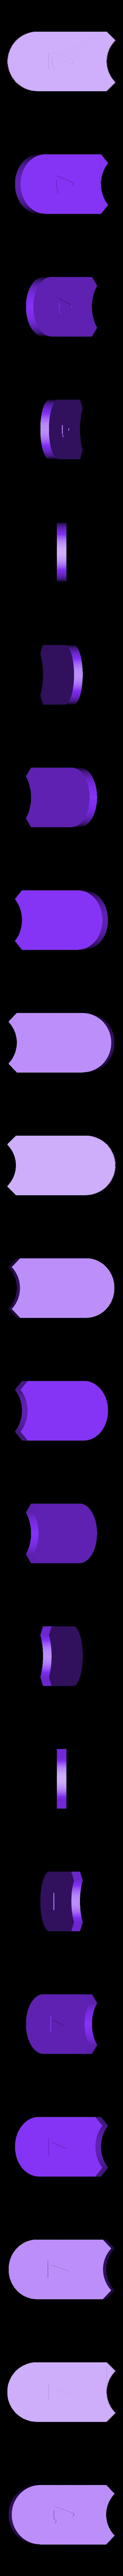 Pomiar_lukow_07.stl Download free STL file Radius measuring toolset • Design to 3D print, kpawel